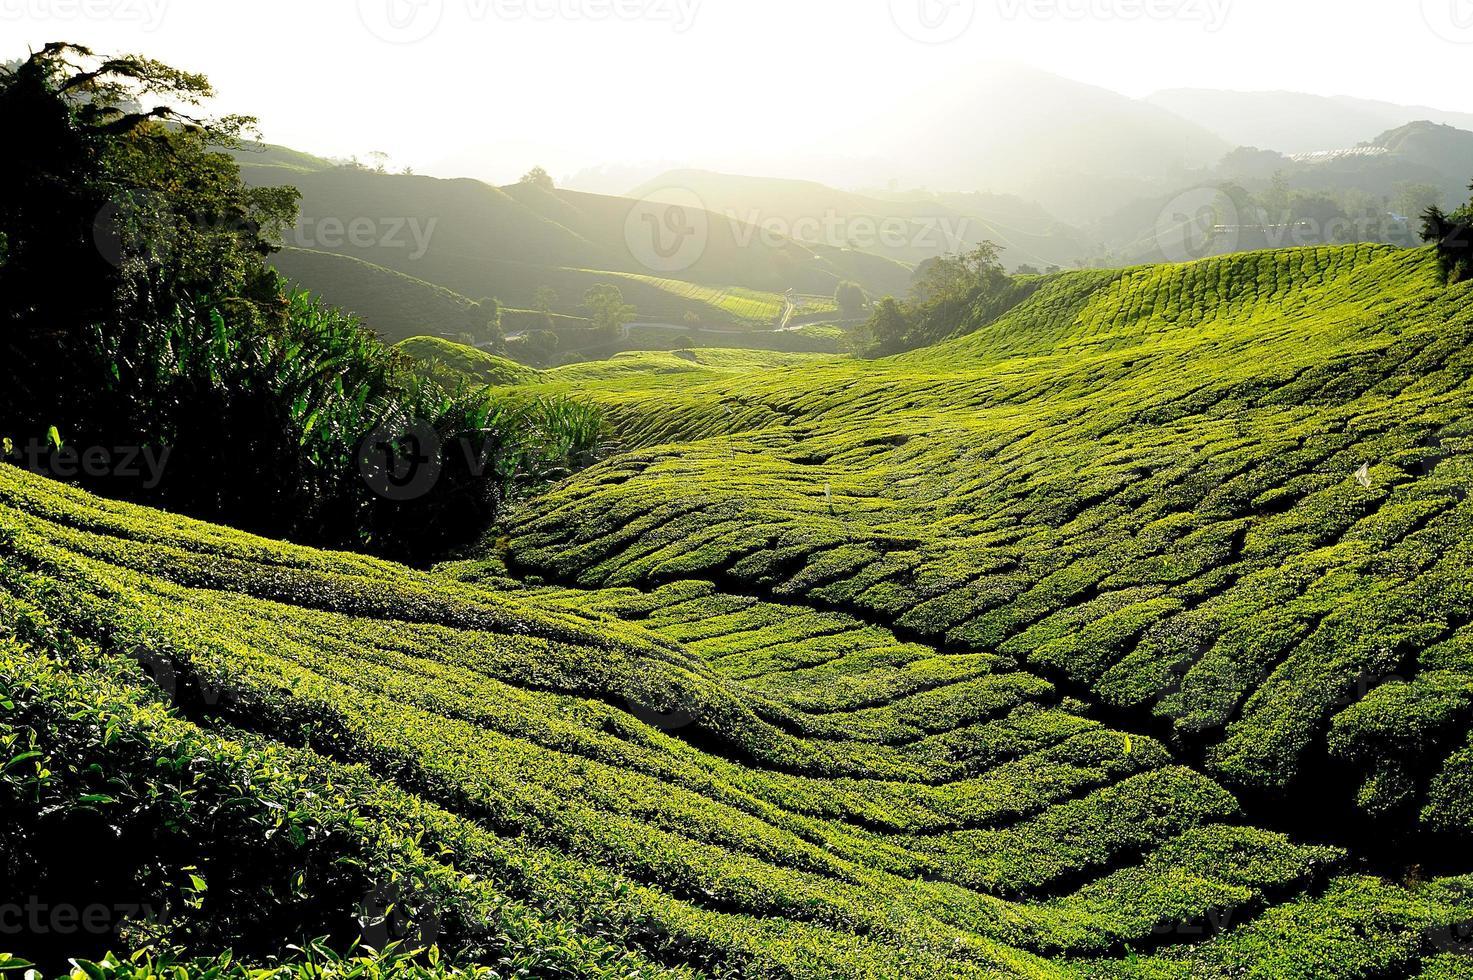 Teeplantagenfelder bei Sonnenaufgang foto